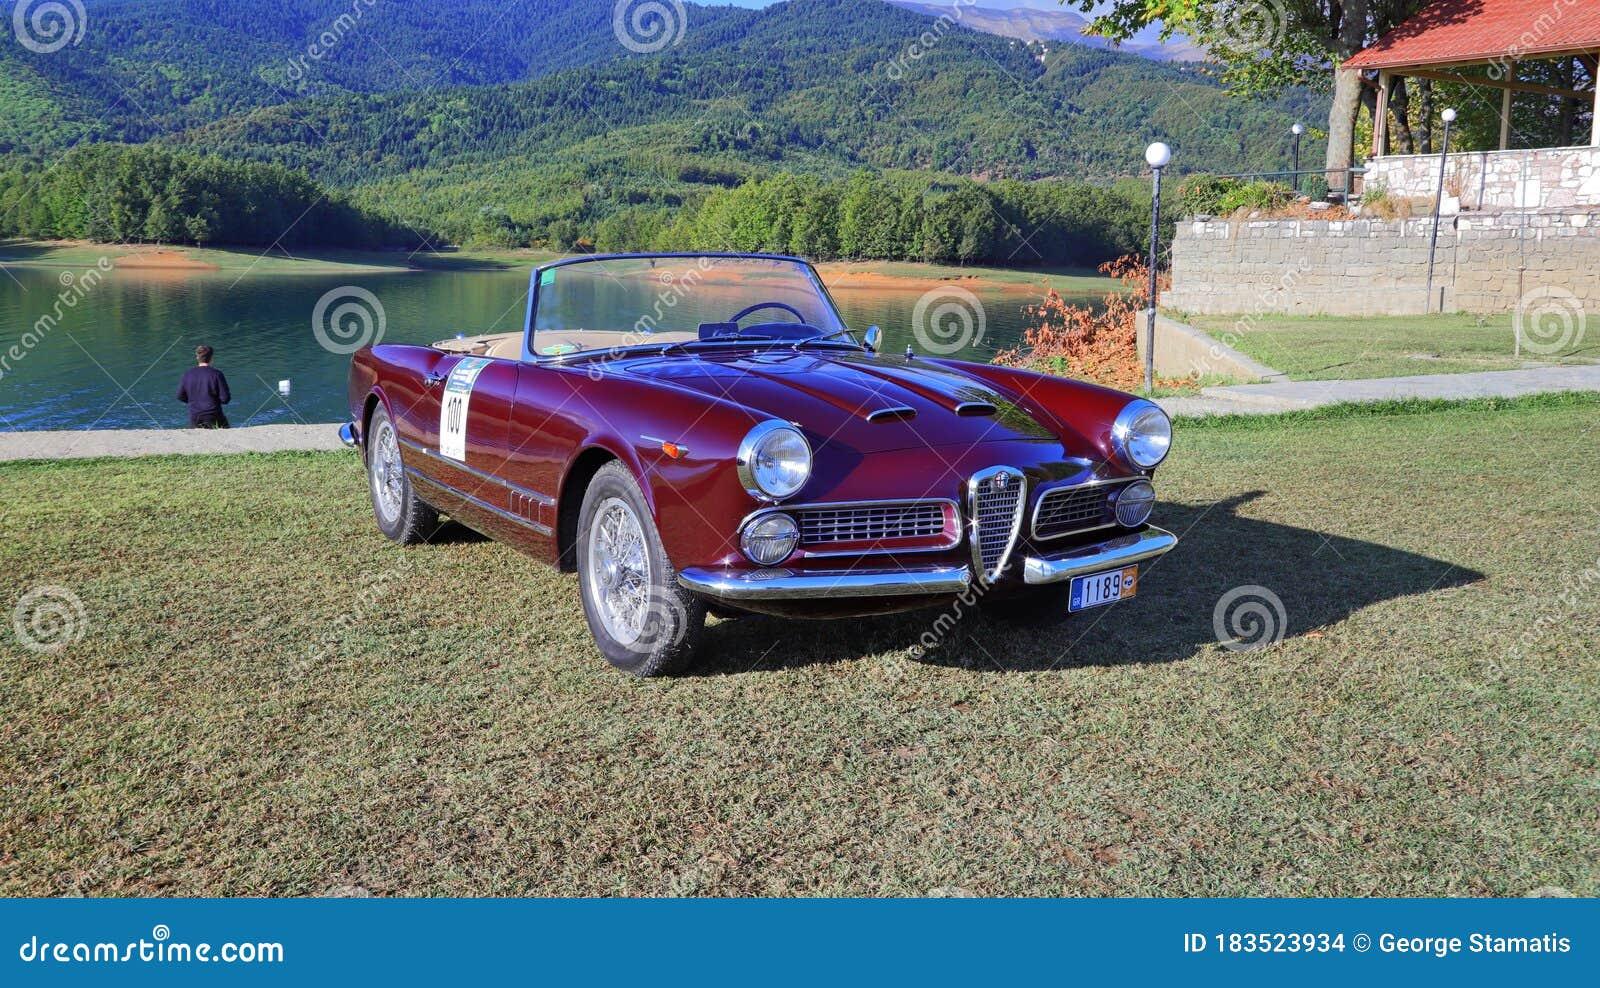 Alfa Romeo Spider 2000 1959 Editorial Stock Image Image Of Vehicle Greece 183523934